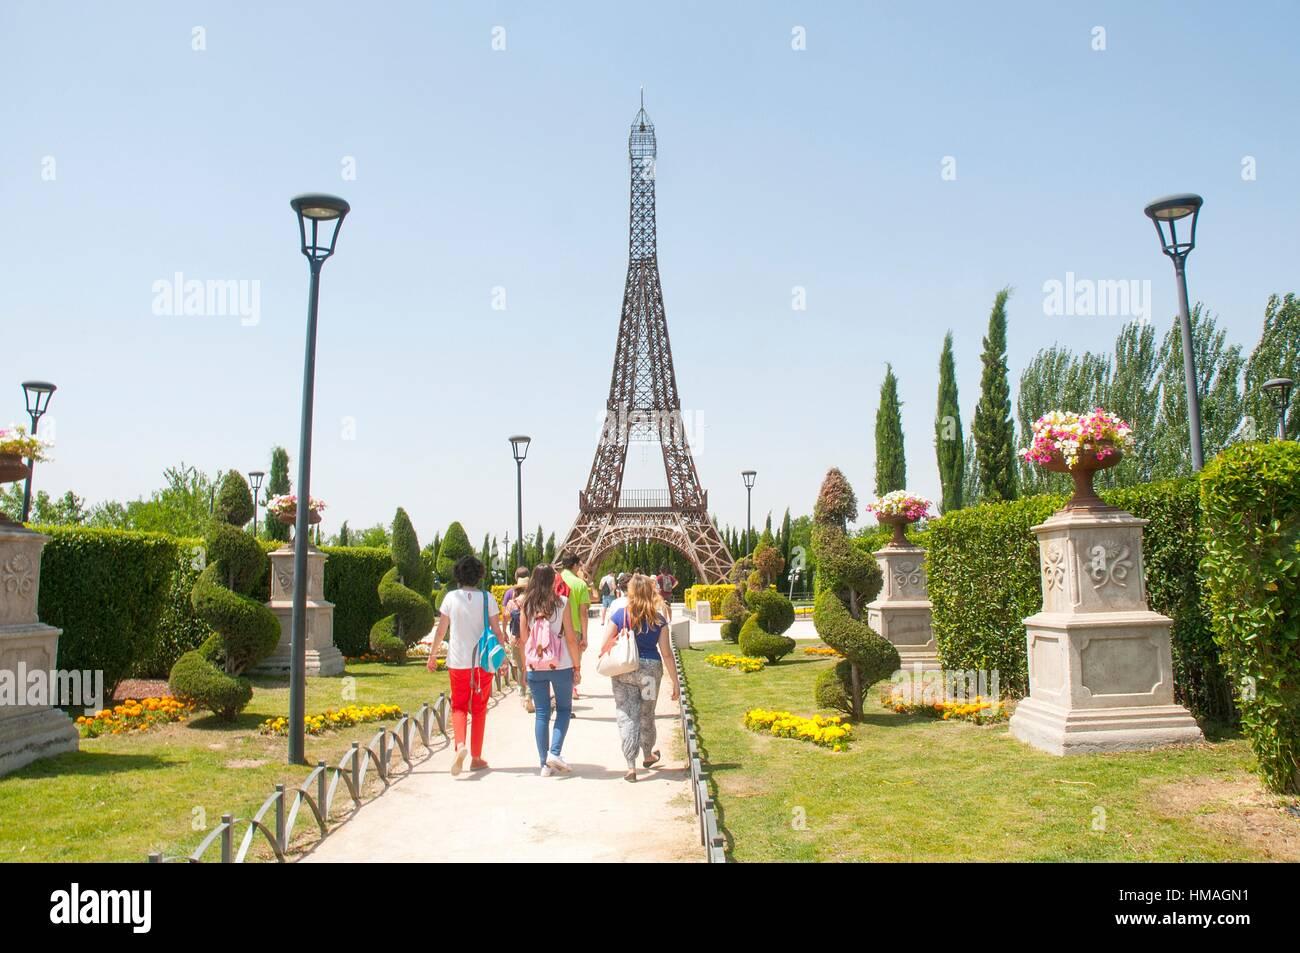 Eiffel Tower, scale model. Parque Europa, Torrejon de Ardoz, Madrid province, Spain. Stock Photo